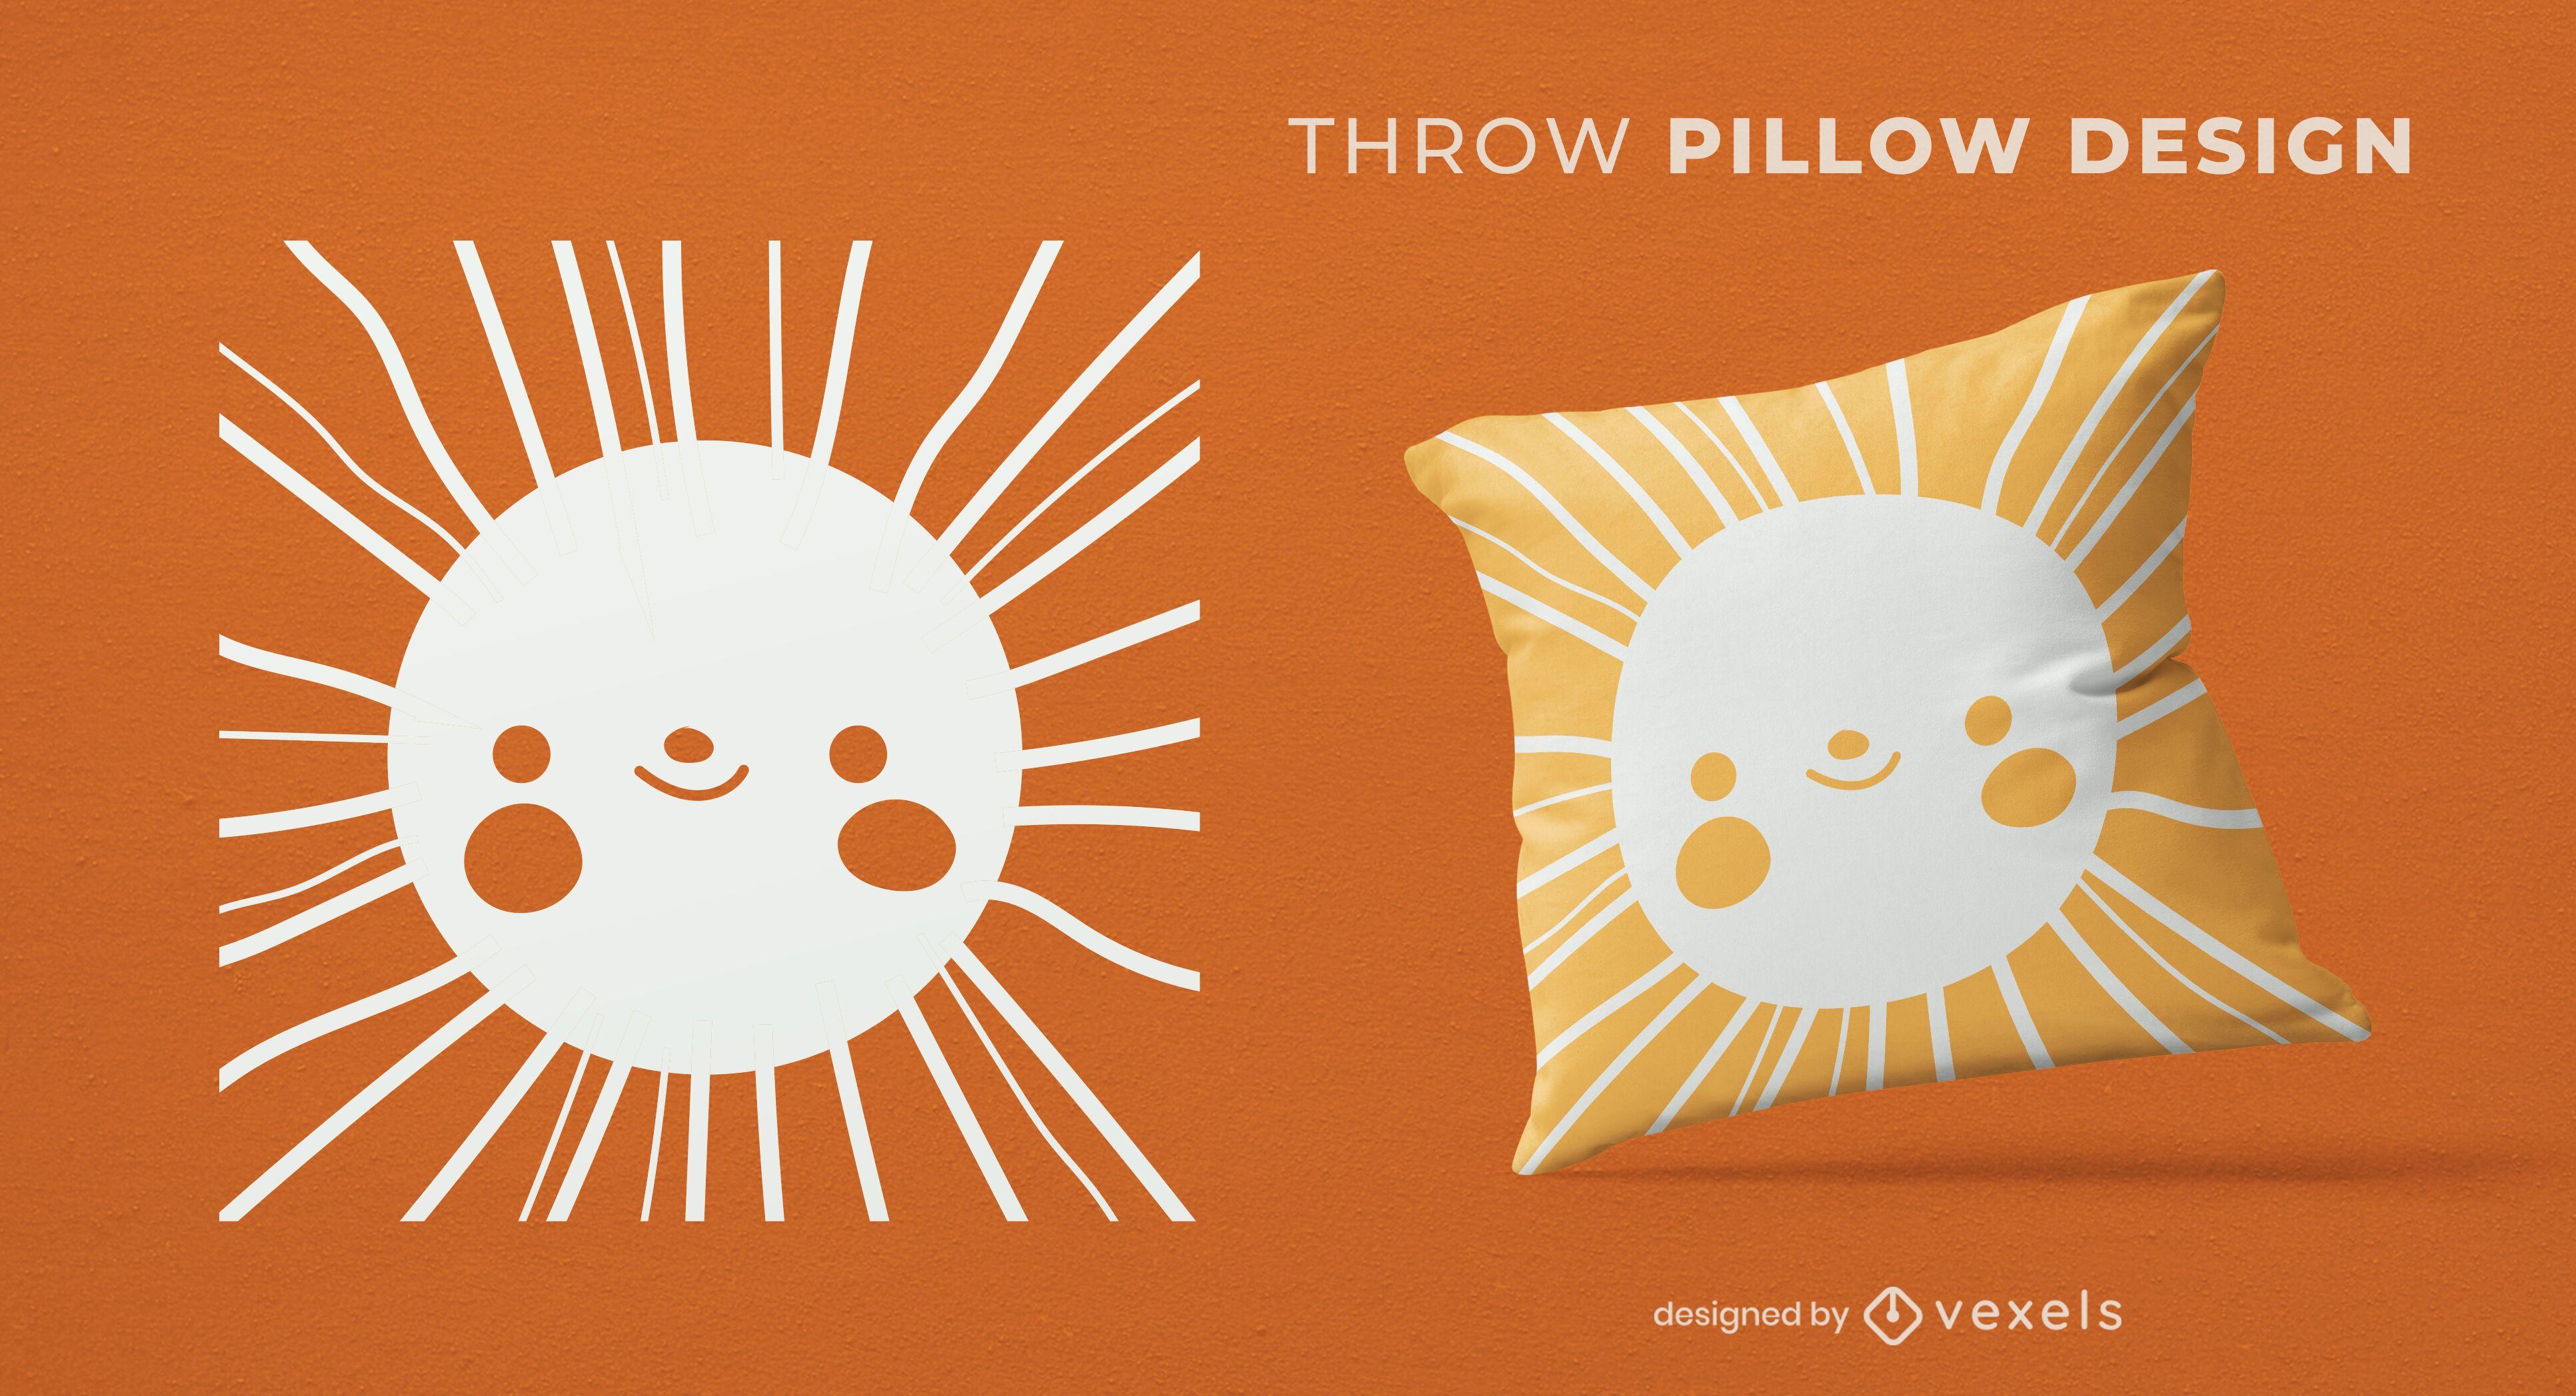 Diseño de almohada de tiro de cara feliz de sol